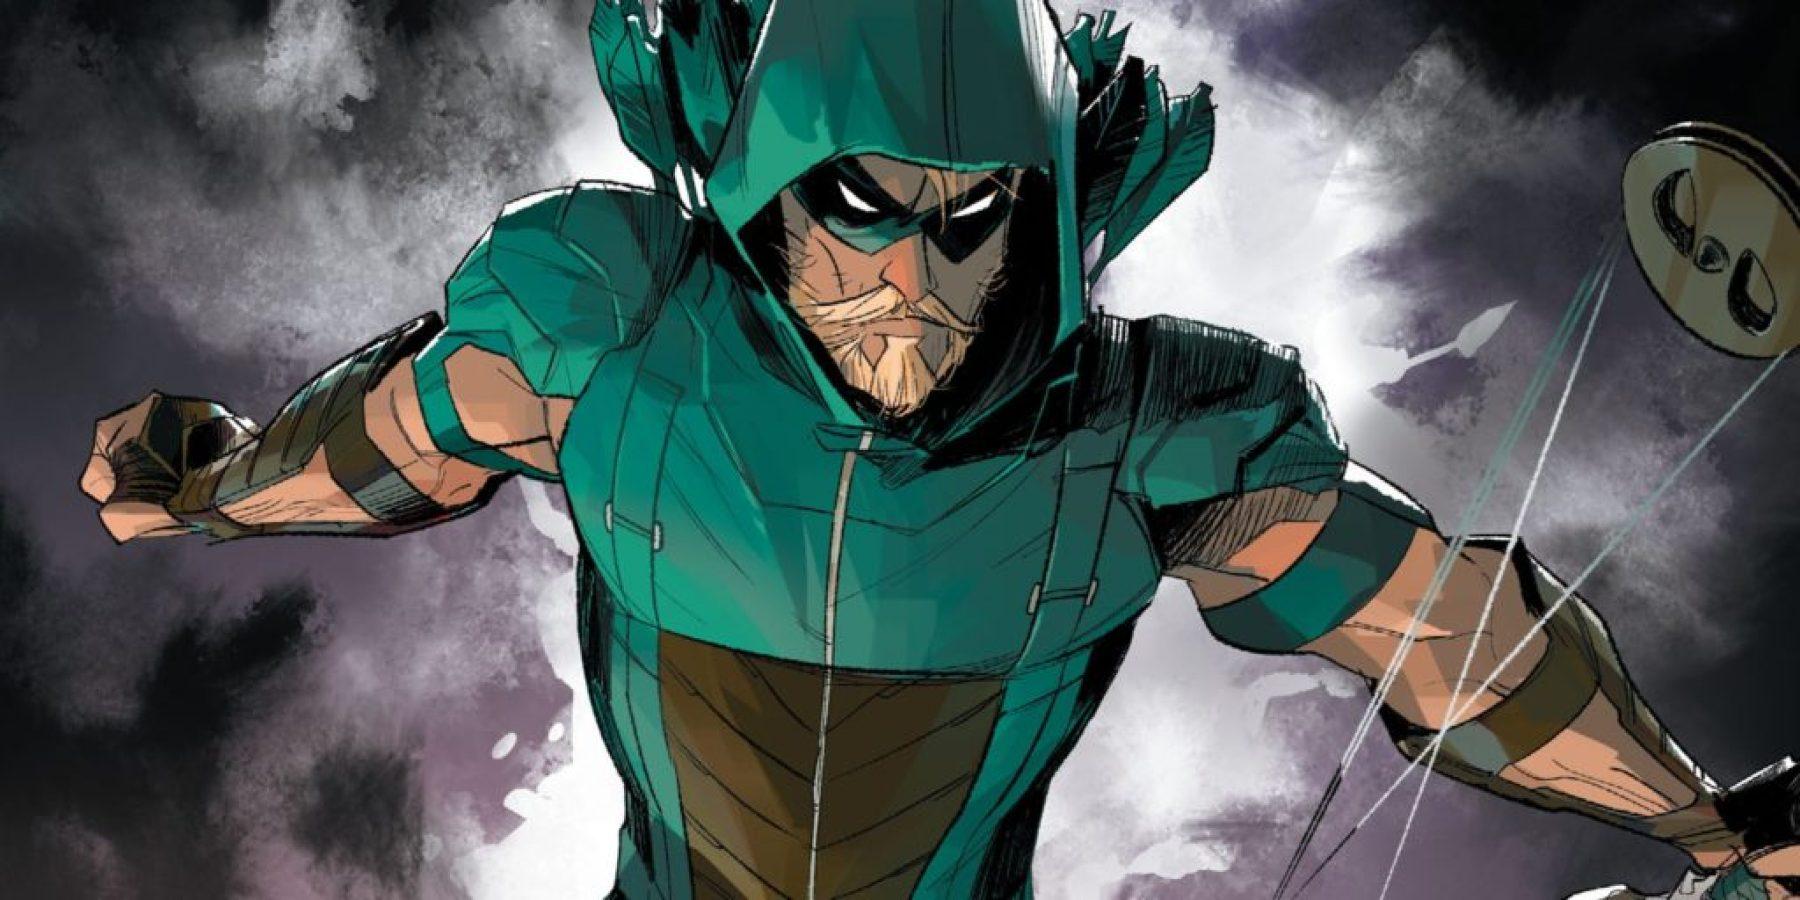 Green Arrow Rebirth #1 by DC Comics